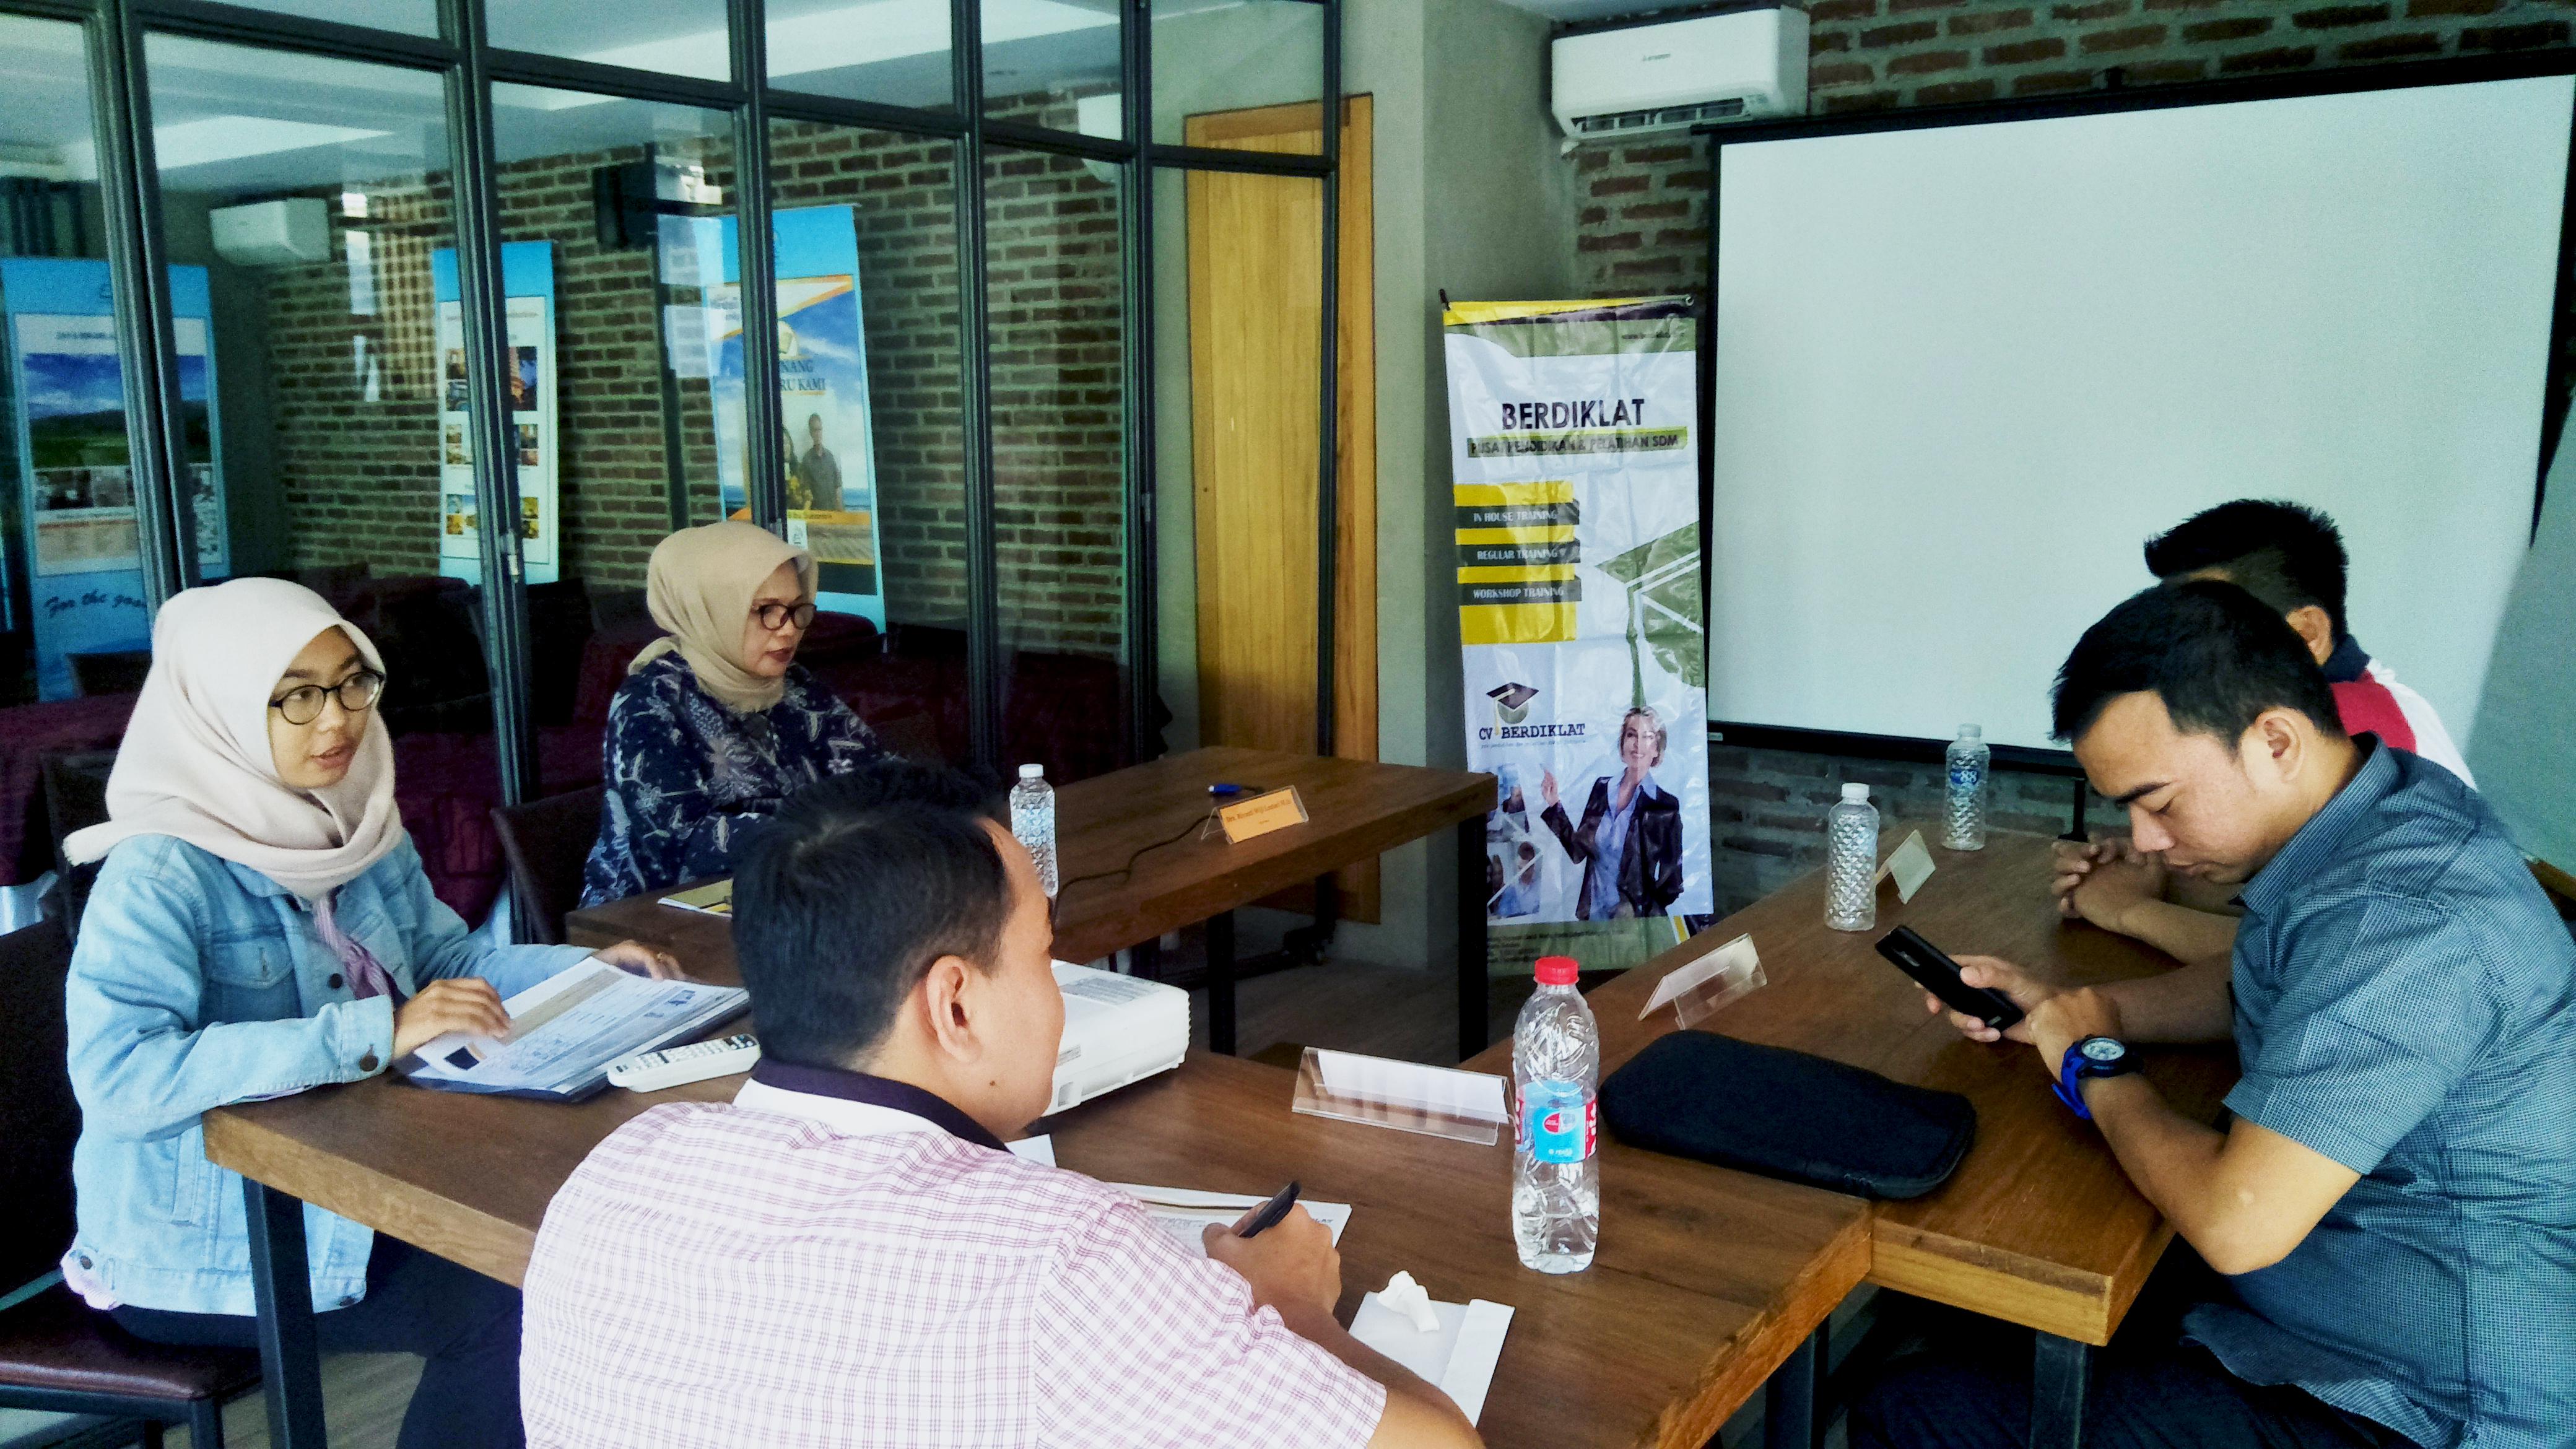 Annual Report Berbasis GCG dan CSR | 📍 Bandung, Jawa Barat | 📅 31 Januari- 2 Februari 2018